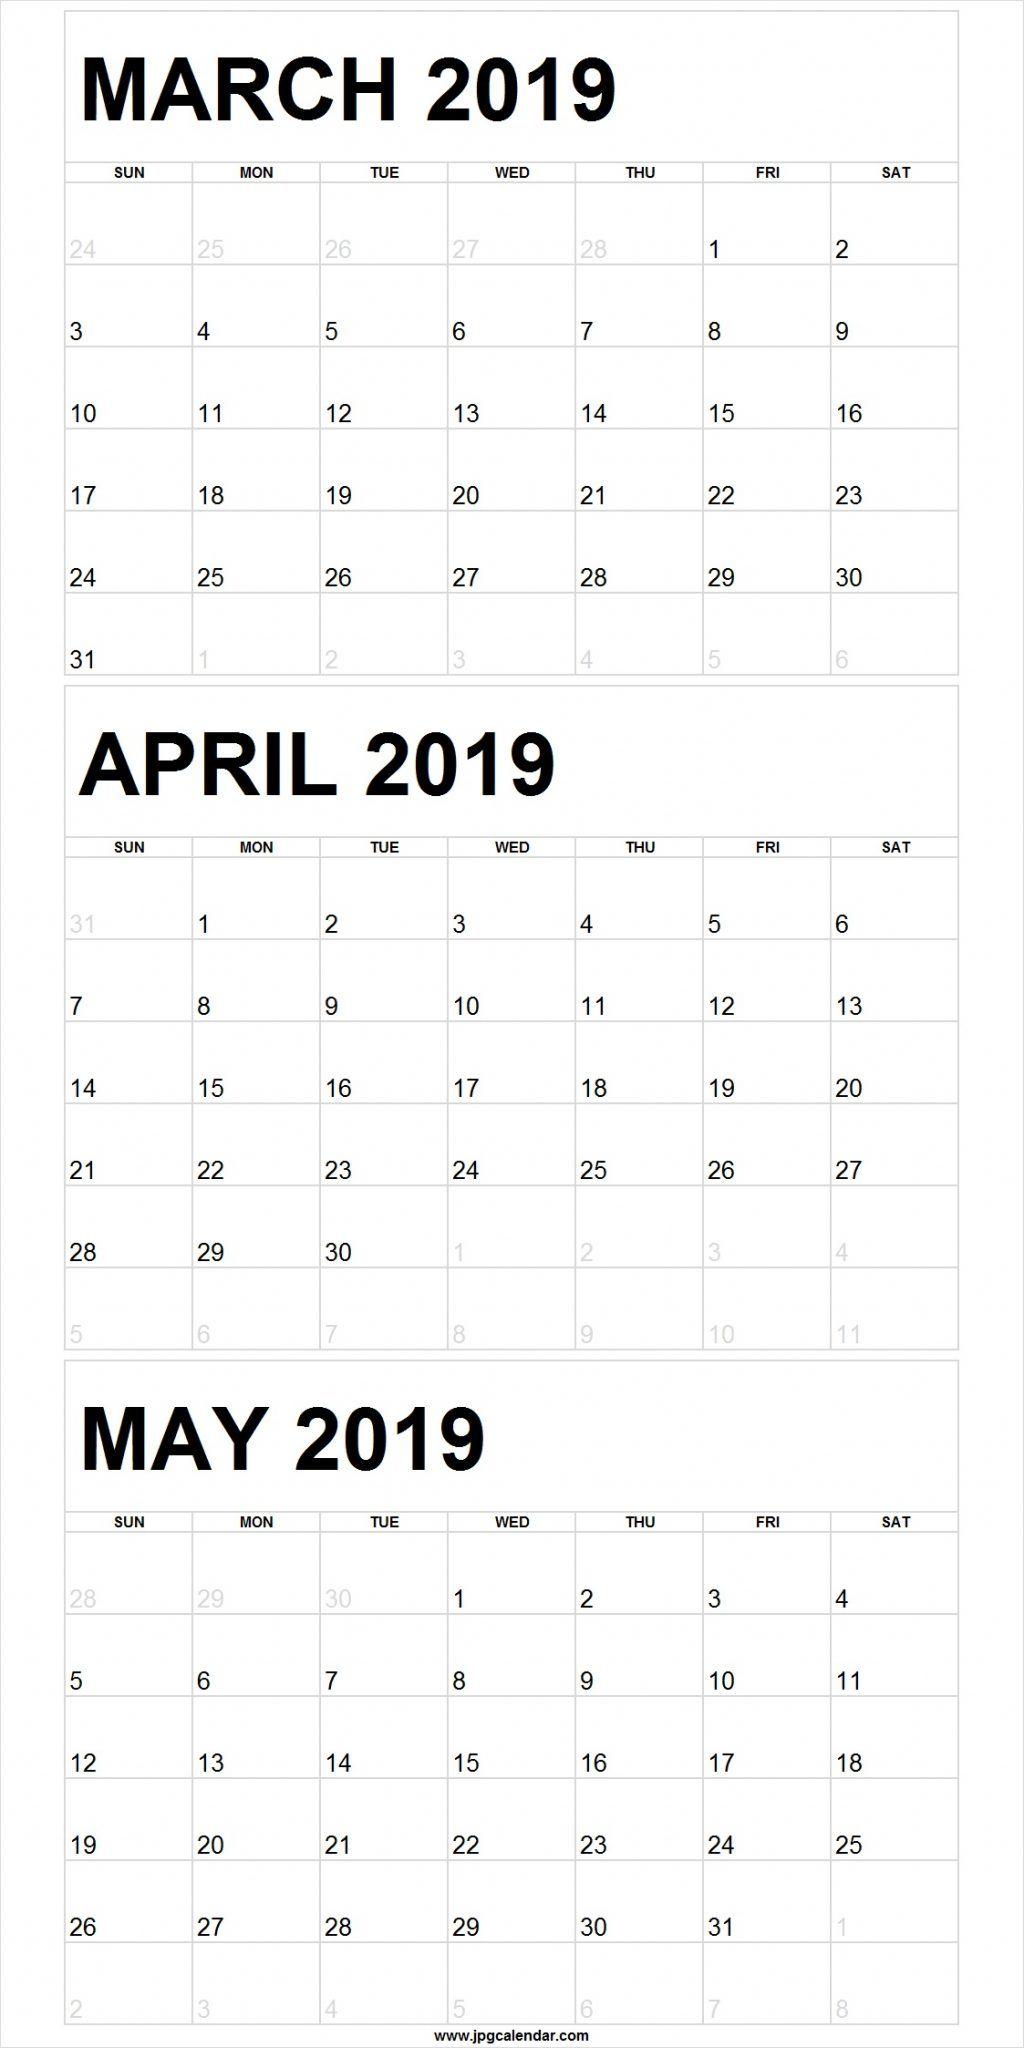 Blank March To May 2019 Calendar Printable | 250+ Free Monthly with regard to Blank 3 Month Printable Monthly Calendar